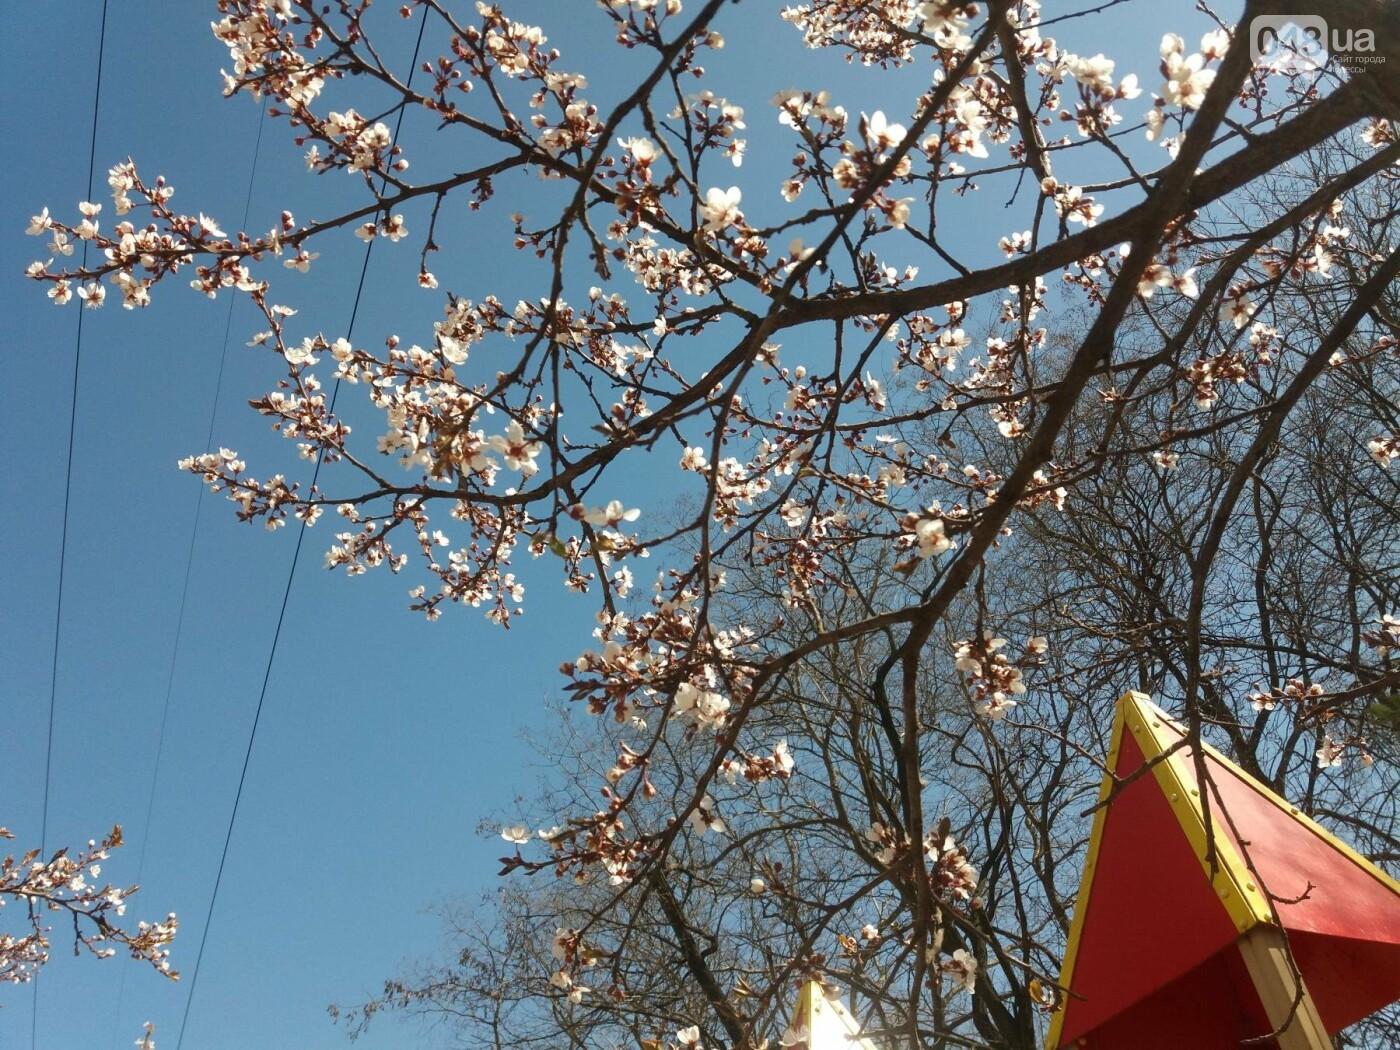 На Одессу обрушилась весна (ФОТОФАКТ), фото-4